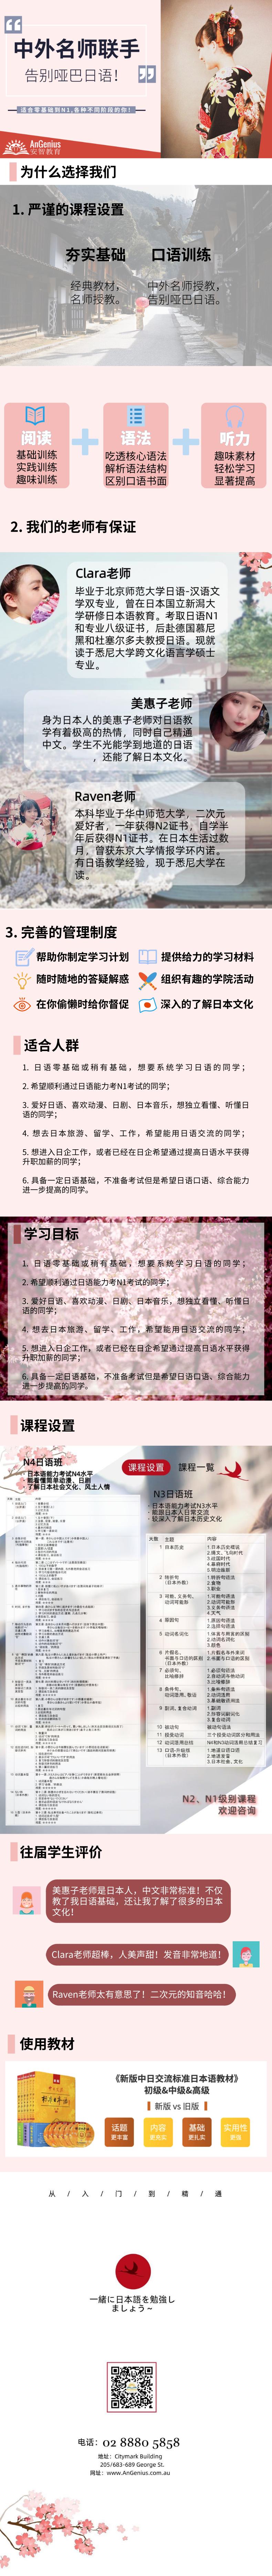 日语2_自定义px_2019.07.22.png